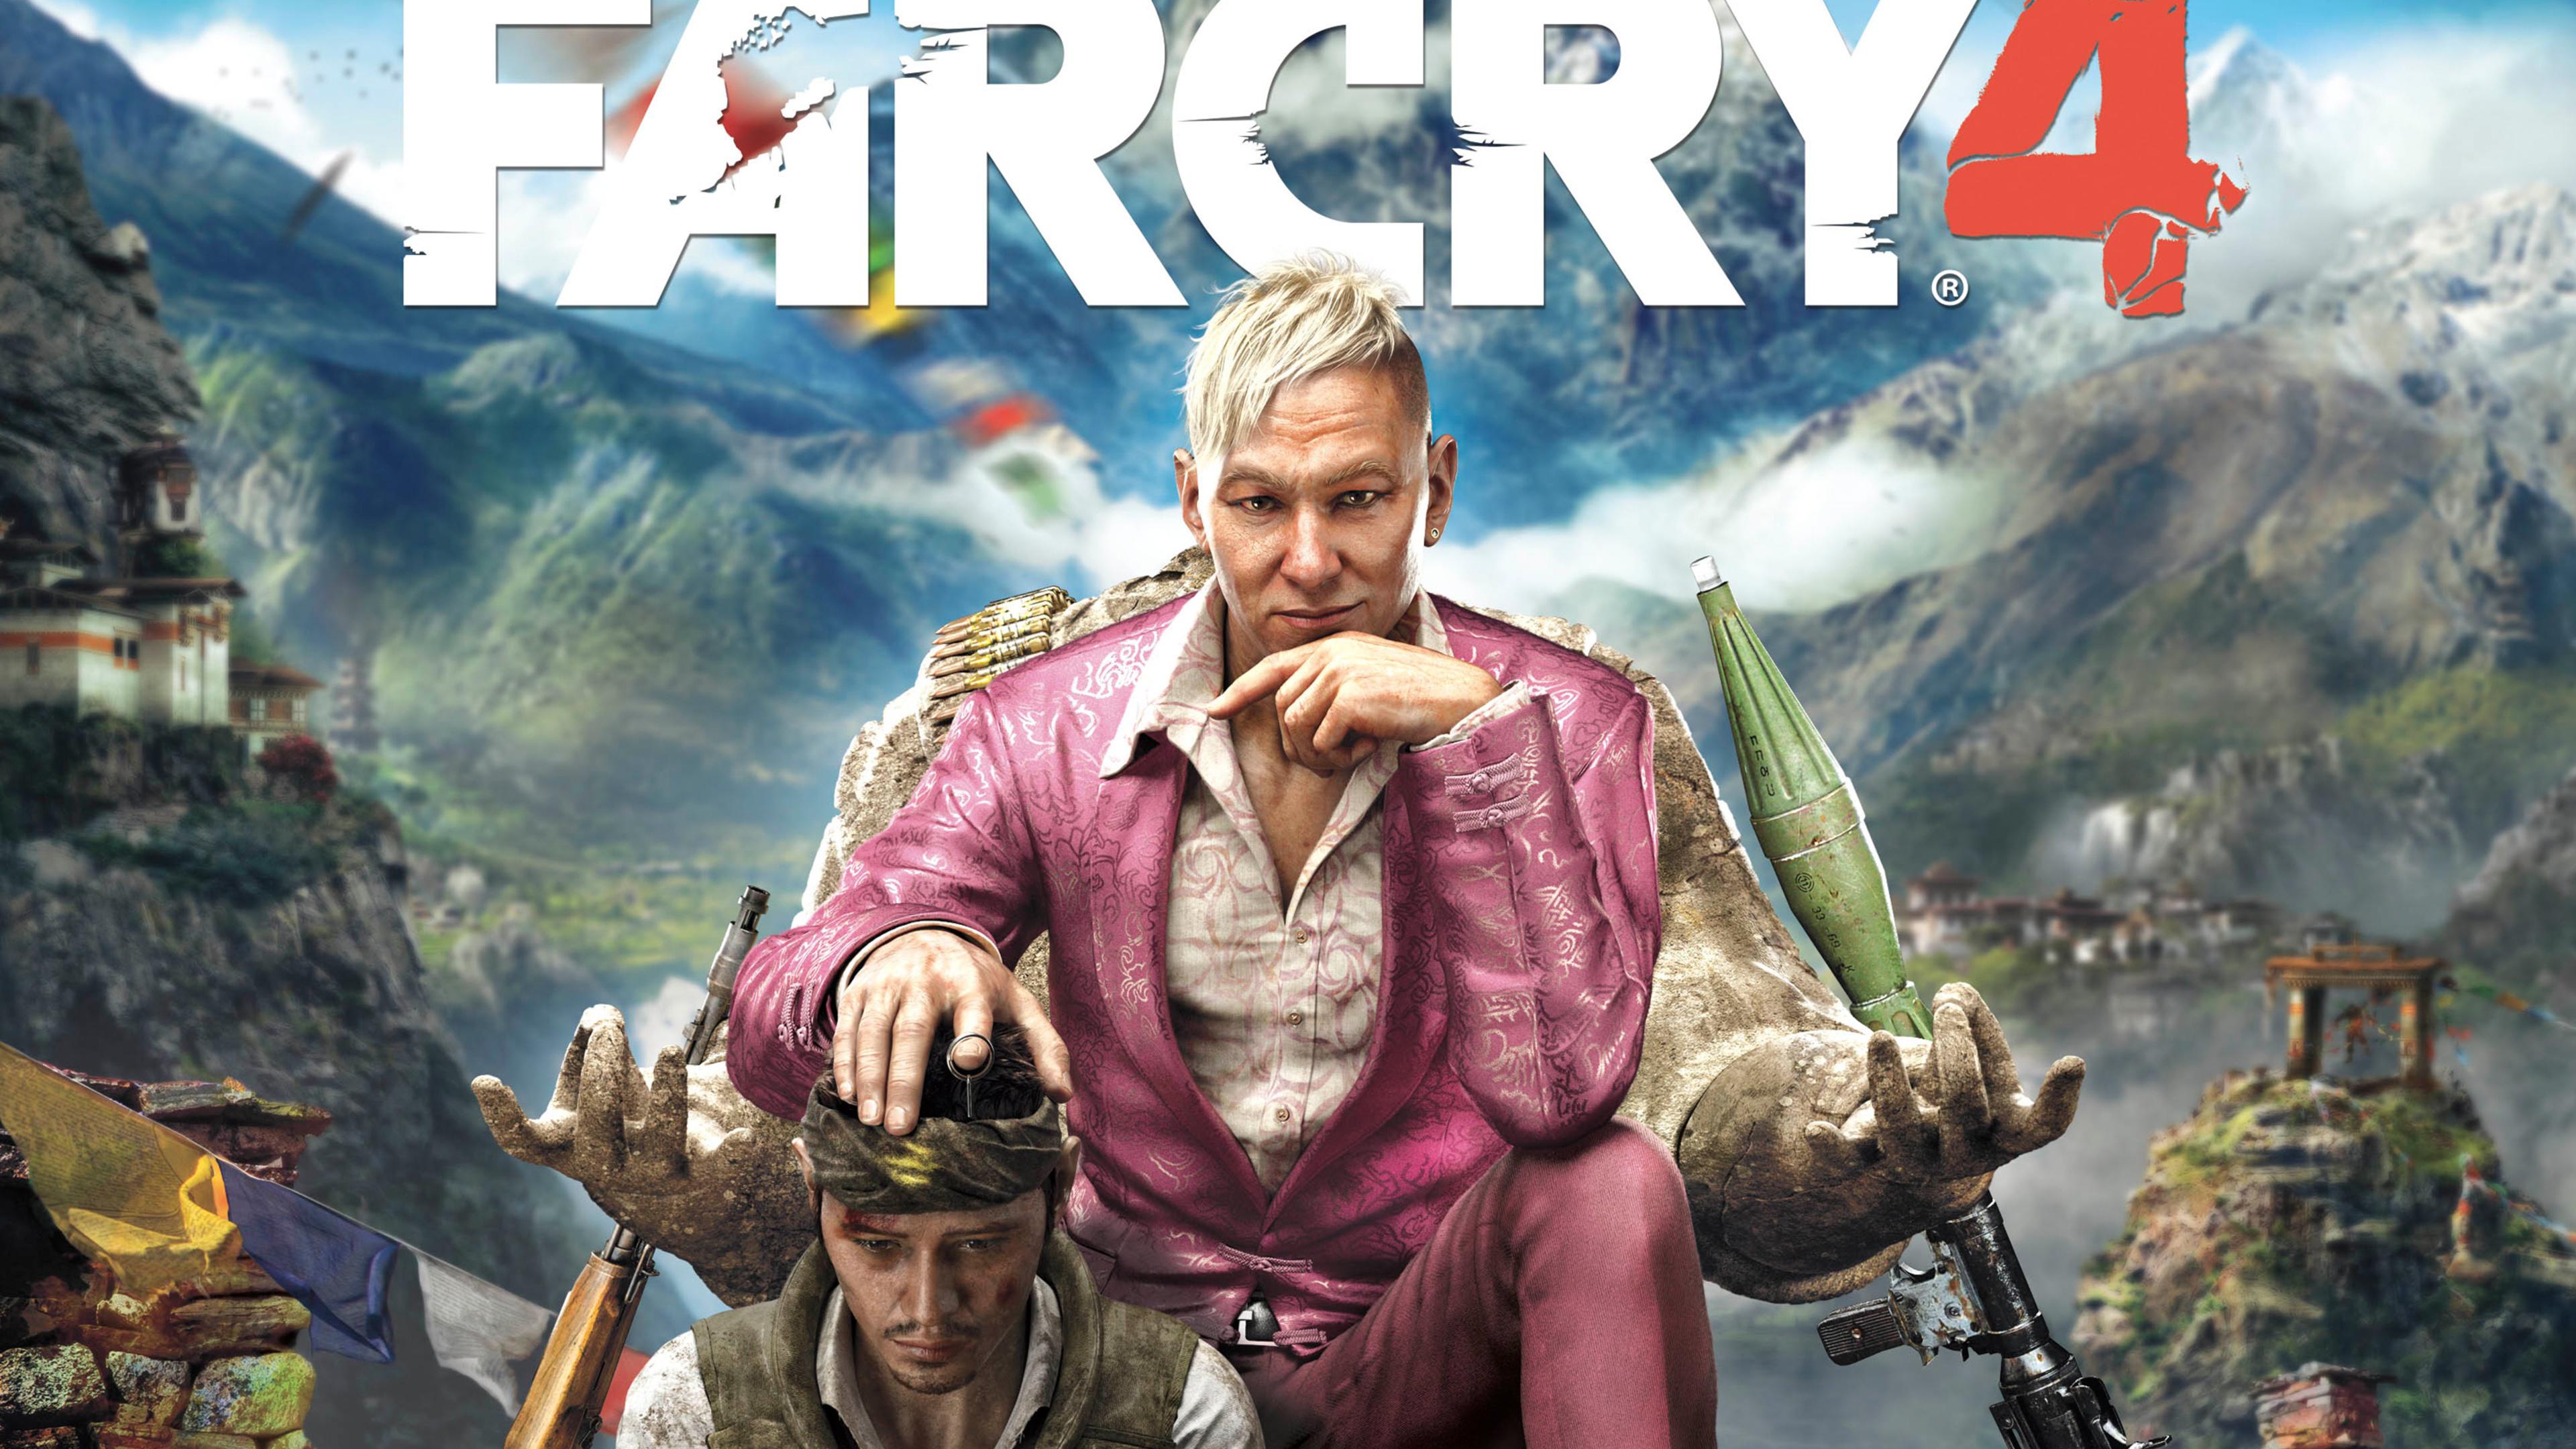 far cry 4 xbox game 1535967051 - Far Cry 4 Xbox Game - xbox games wallpapers, ps games wallpapers, pc games wallpapers, games wallpapers, far cry wallpapers